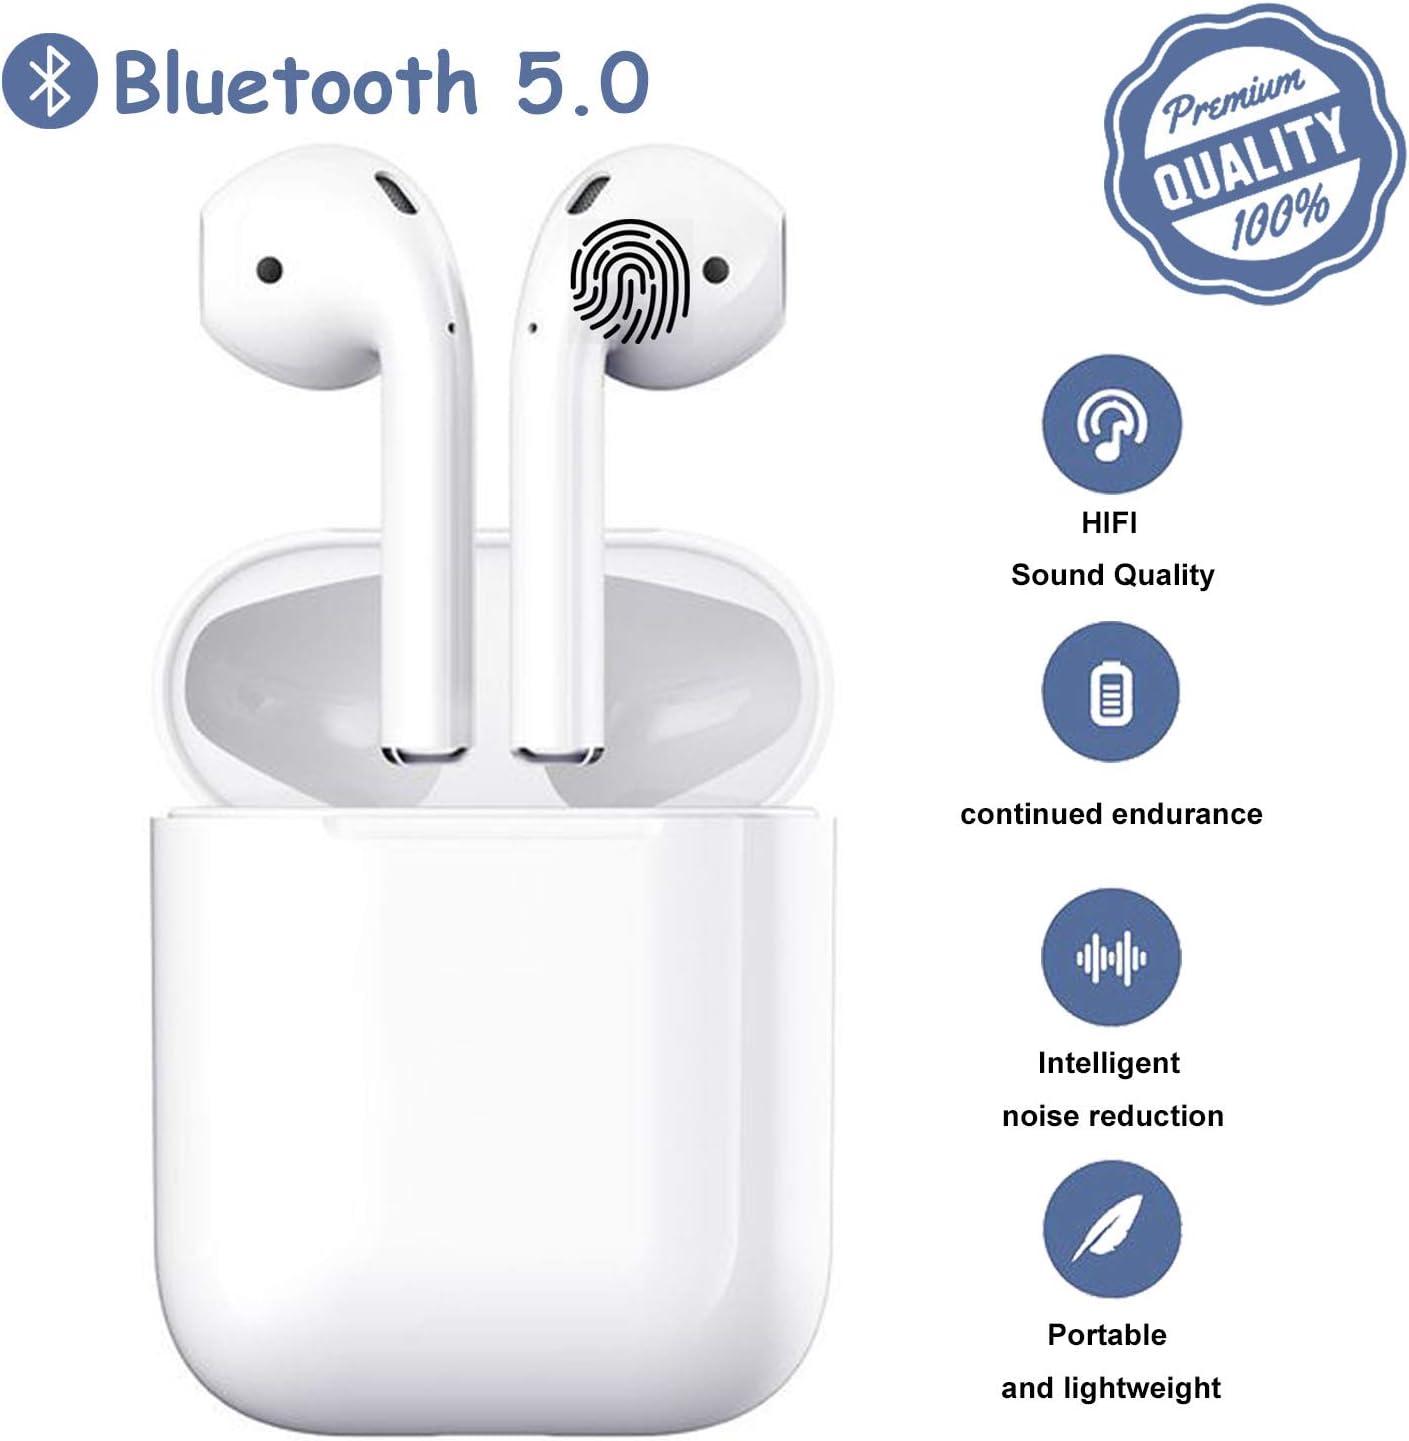 Auriculares inalámbricos Bluetooth 5.0,Estuche de Carga portátil, micrófono HD Incorporado y estéreo 3D,Resistente al Agua IPX5, Compatible con Airpods Android/iPhone/Huawei/Samsung